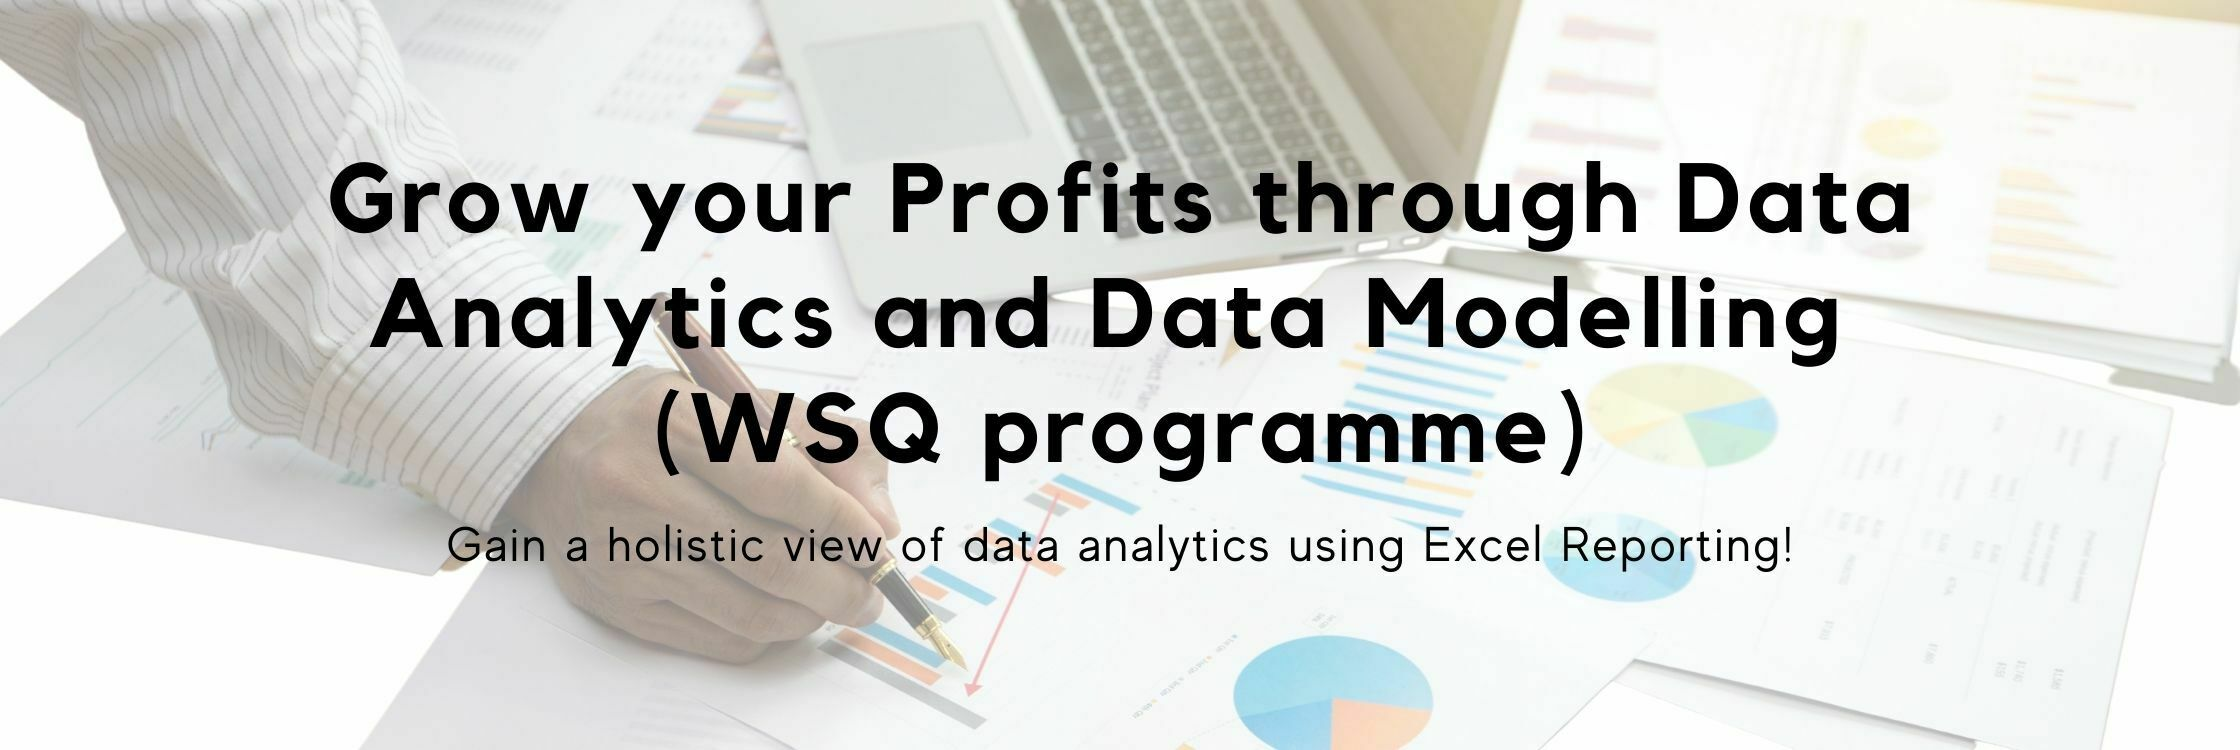 Data Analytics and Data Modelling